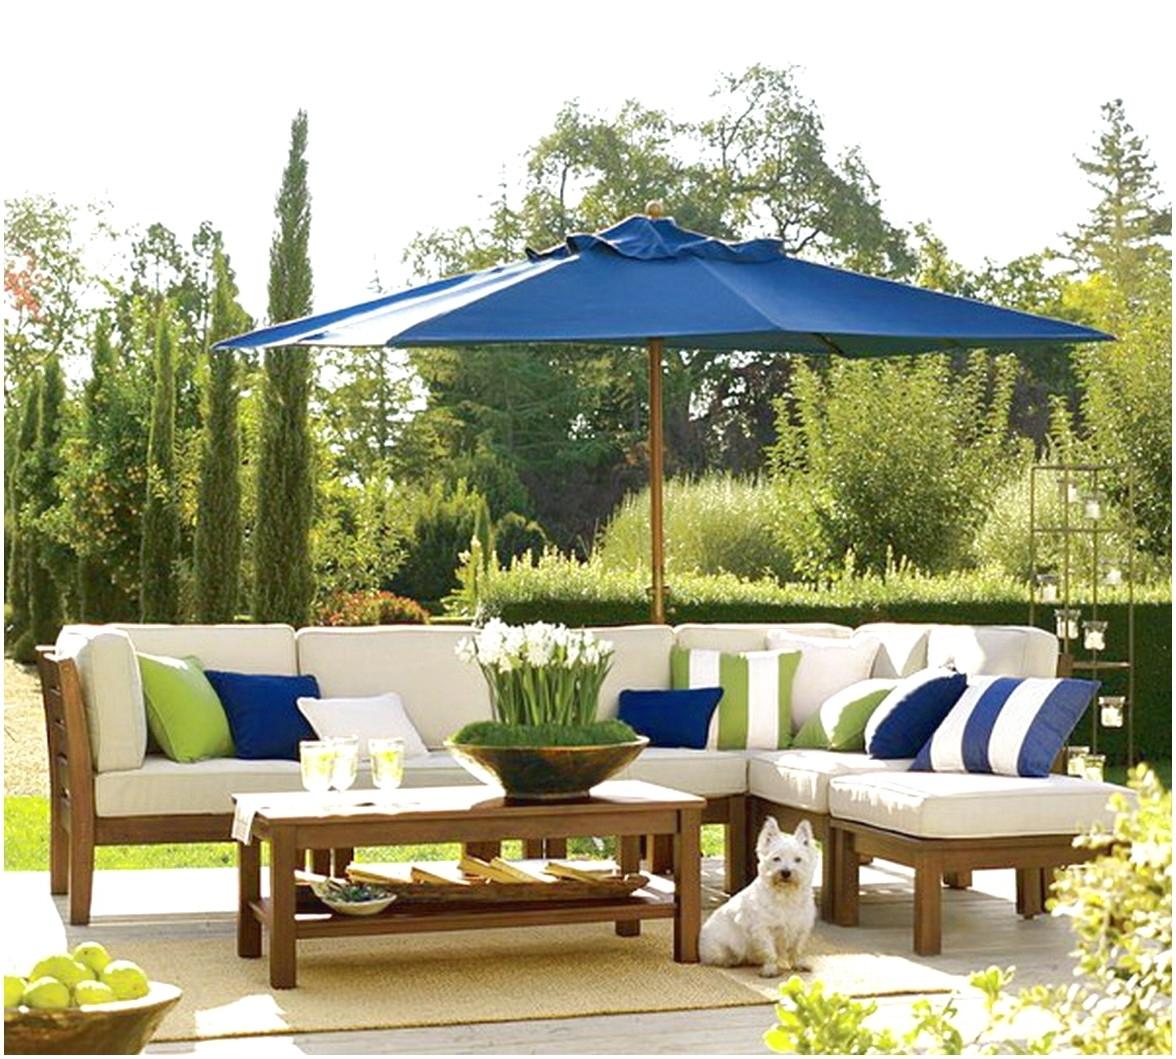 Preferred Outdoor Patio Furniture With Blue Patio Umbrella : Surprising Design Intended For Blue Patio Umbrellas (View 7 of 20)